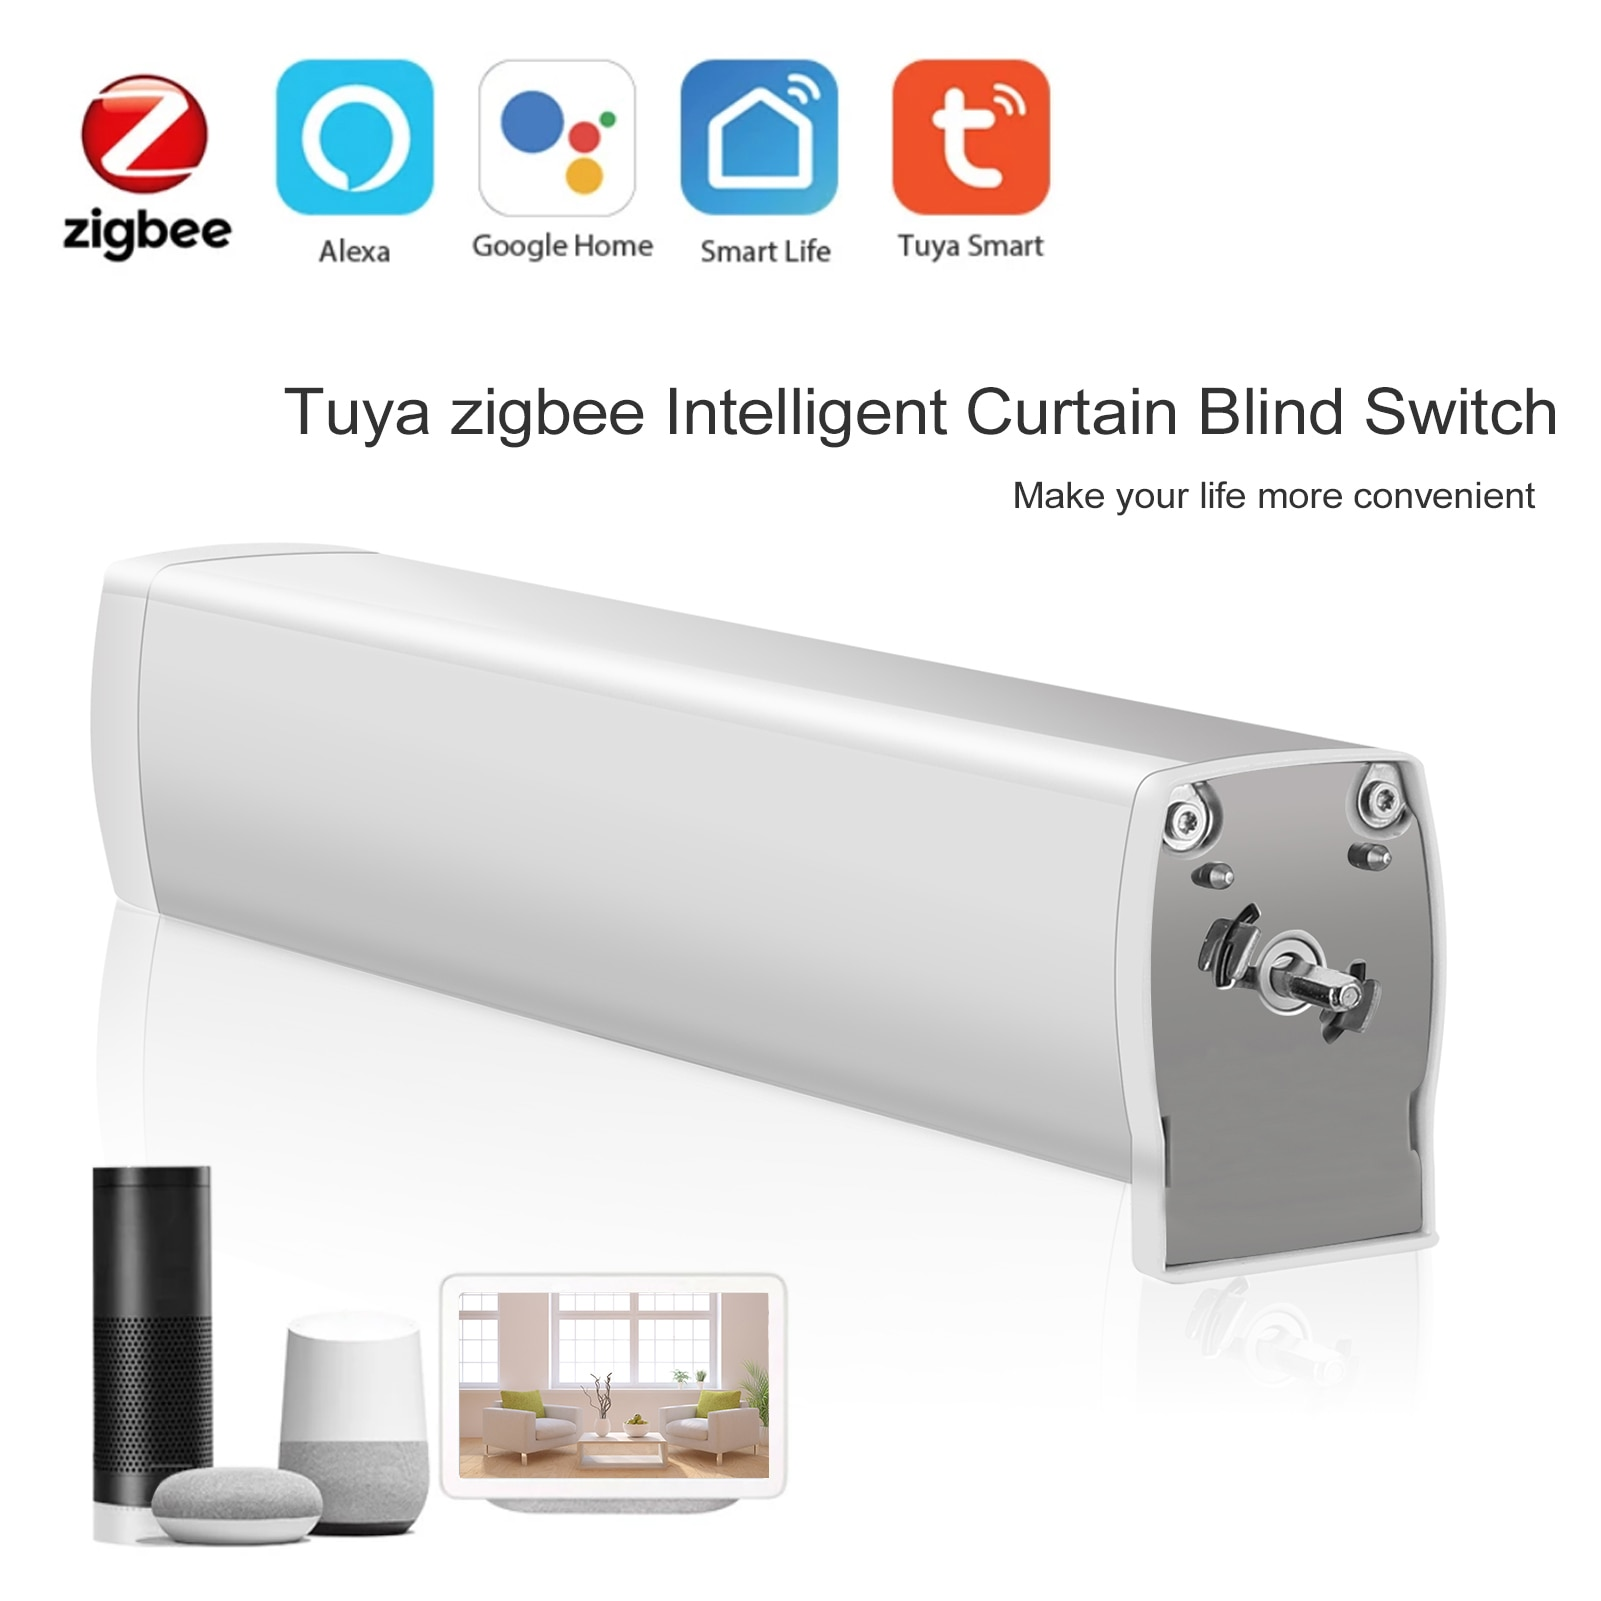 Tuya ZigBee-مفتاح ستارة ذكي ، بكرة كهربائية بمحرك ، متوافق مع Alexa Google Assistant IFTTT